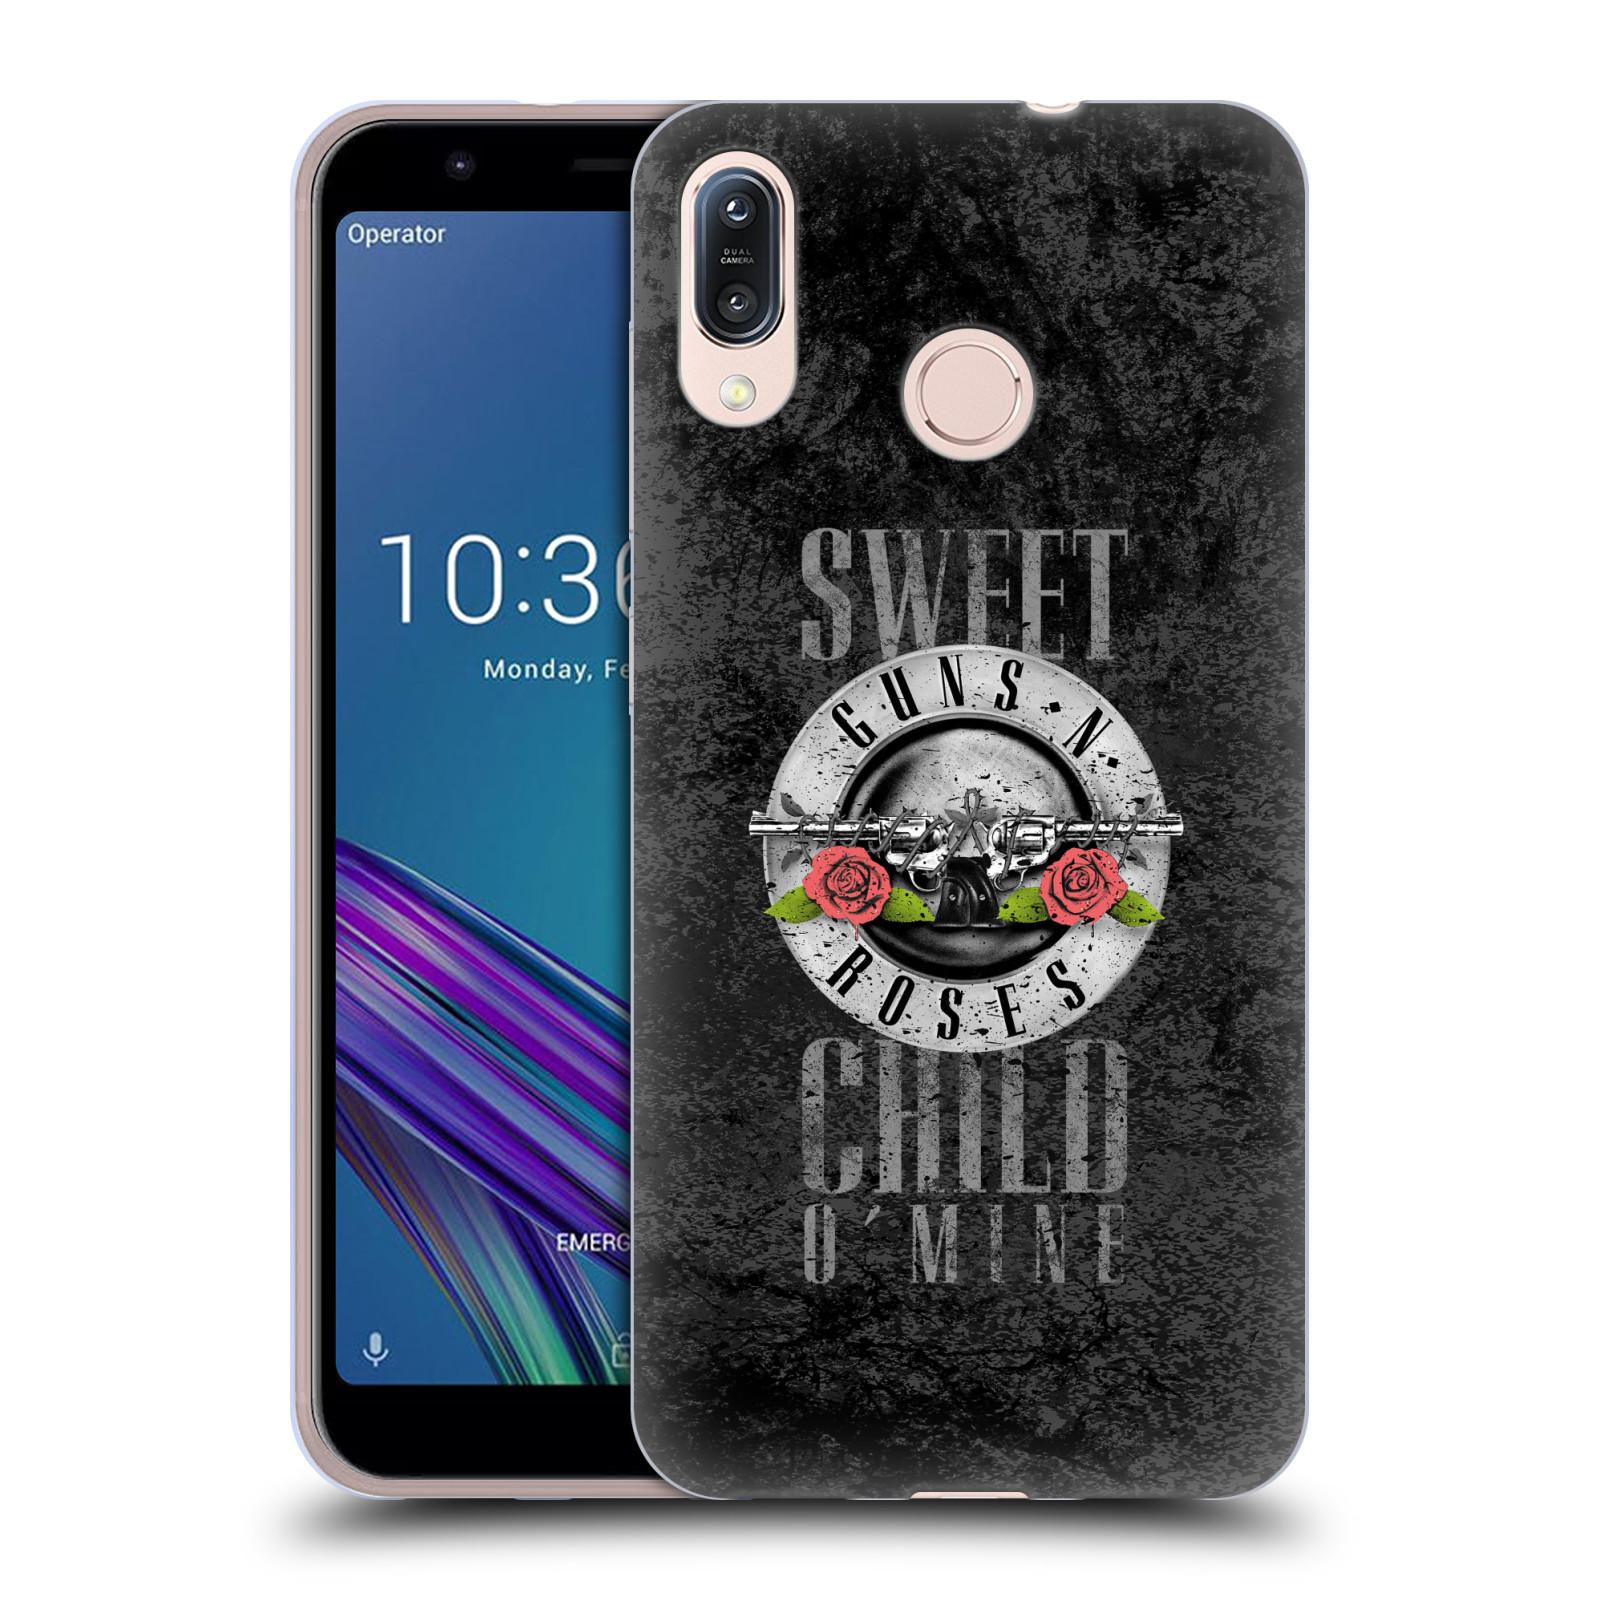 Silikonové pouzdro na mobil Asus Zenfone Max M1 ZB555KL - Head Case - Guns N' Roses - Sweet Child